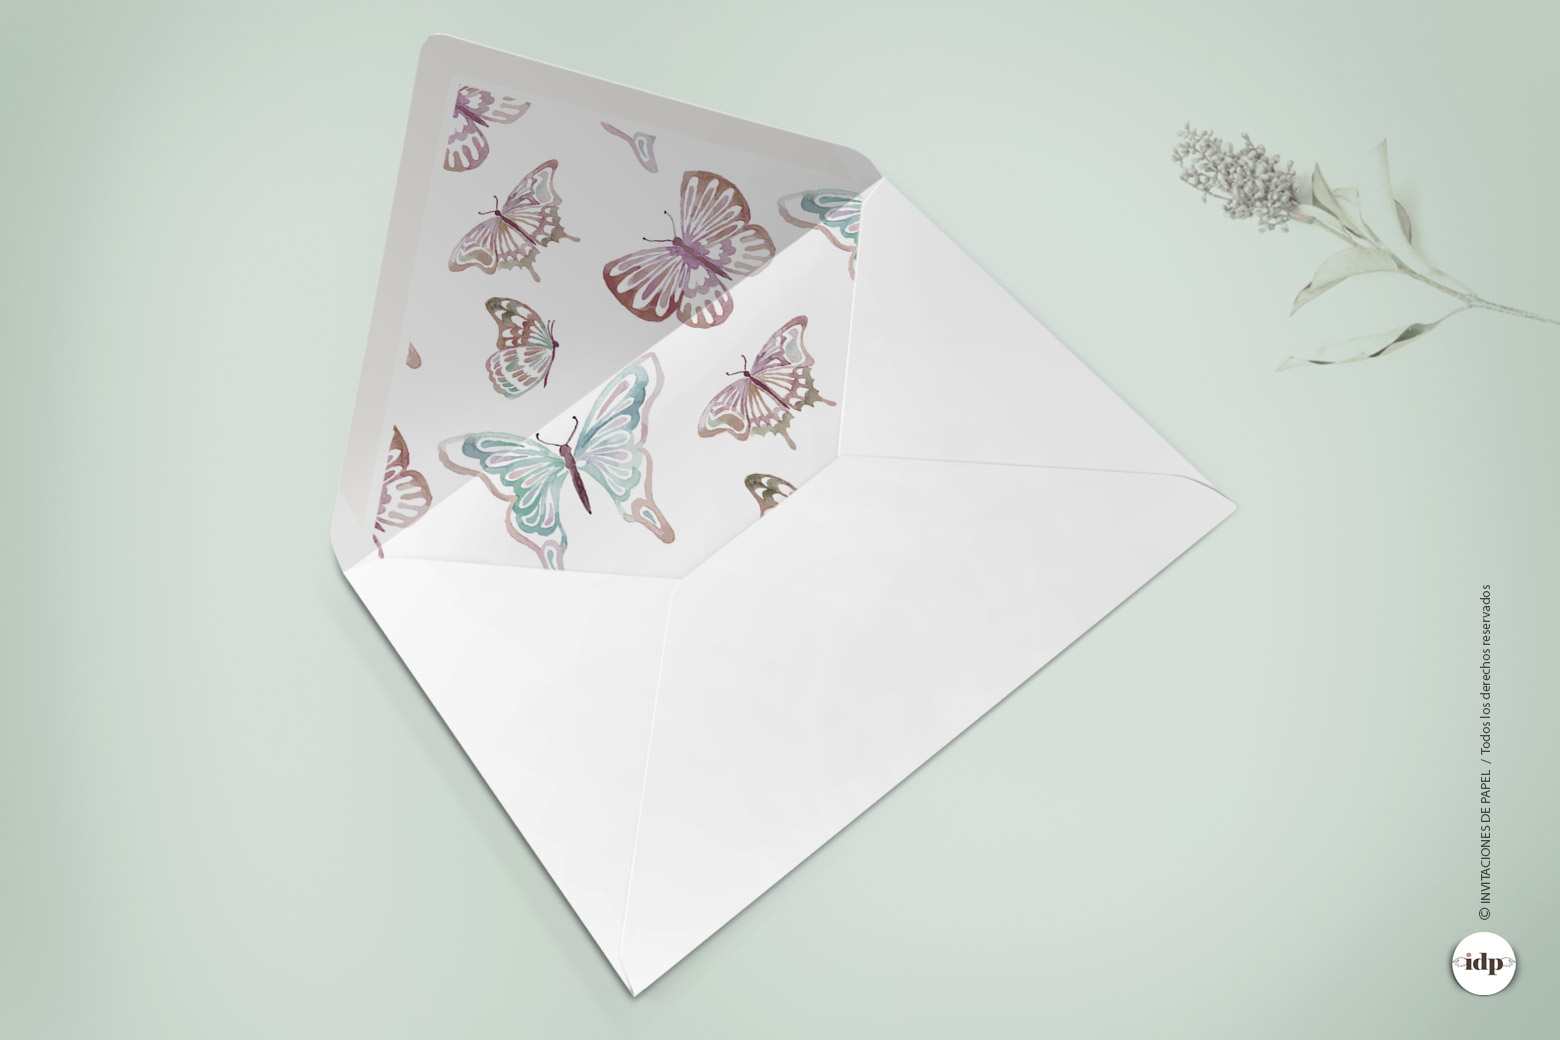 Sobres Decorados para Boda Sencillos con Mariposas en Acuarela